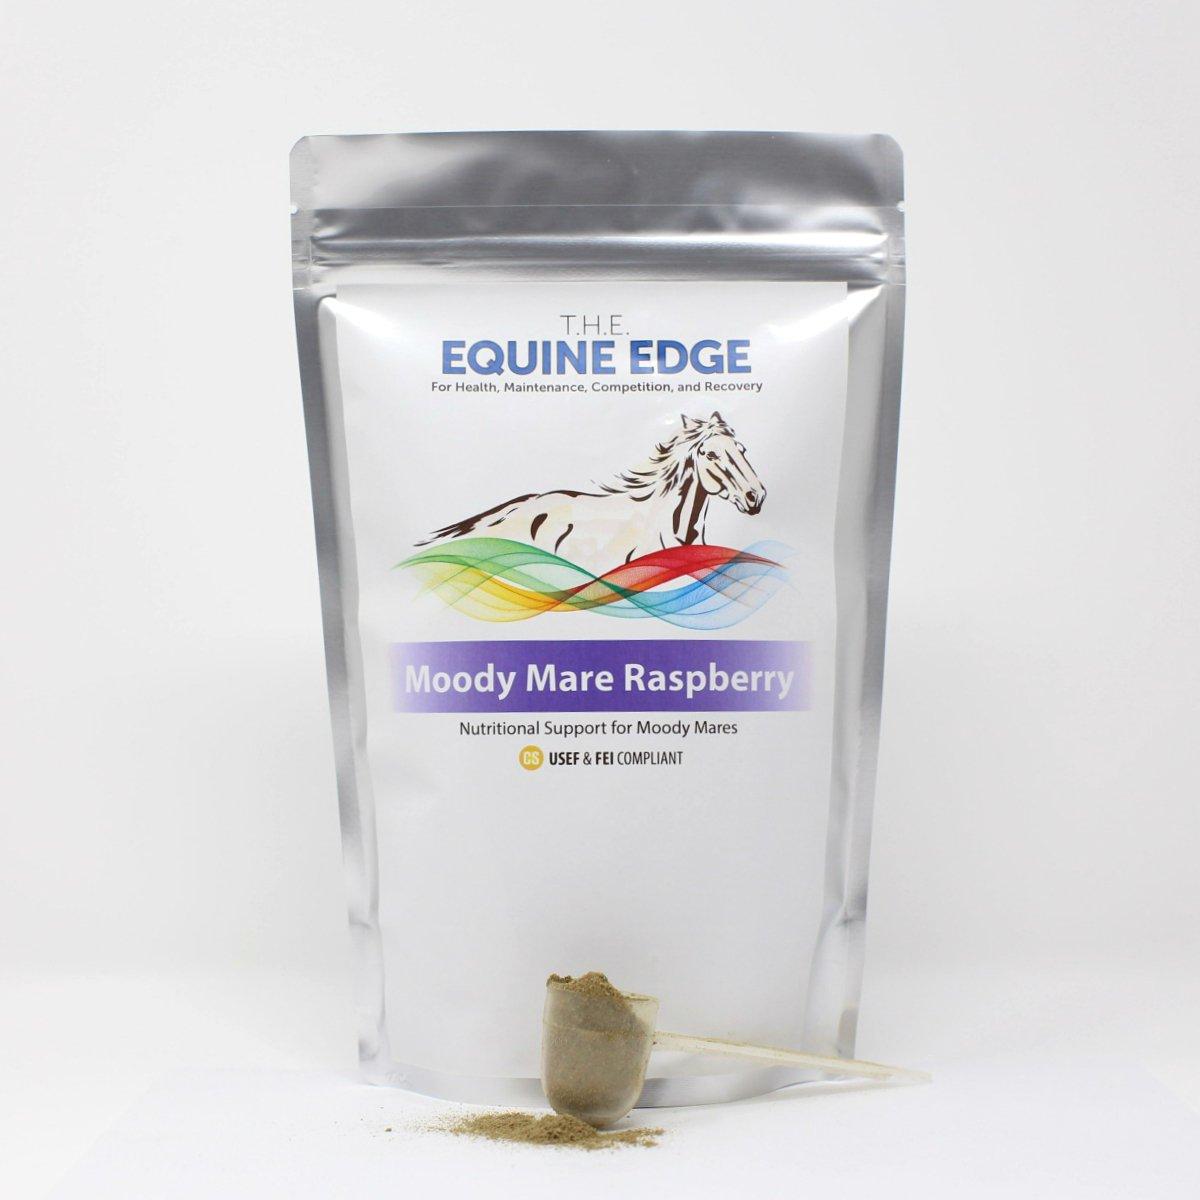 T.H.E. Equine Edge Moody Mare Raspberry - Pure Organic Raspberry Leaf for Calming, 30 Servings